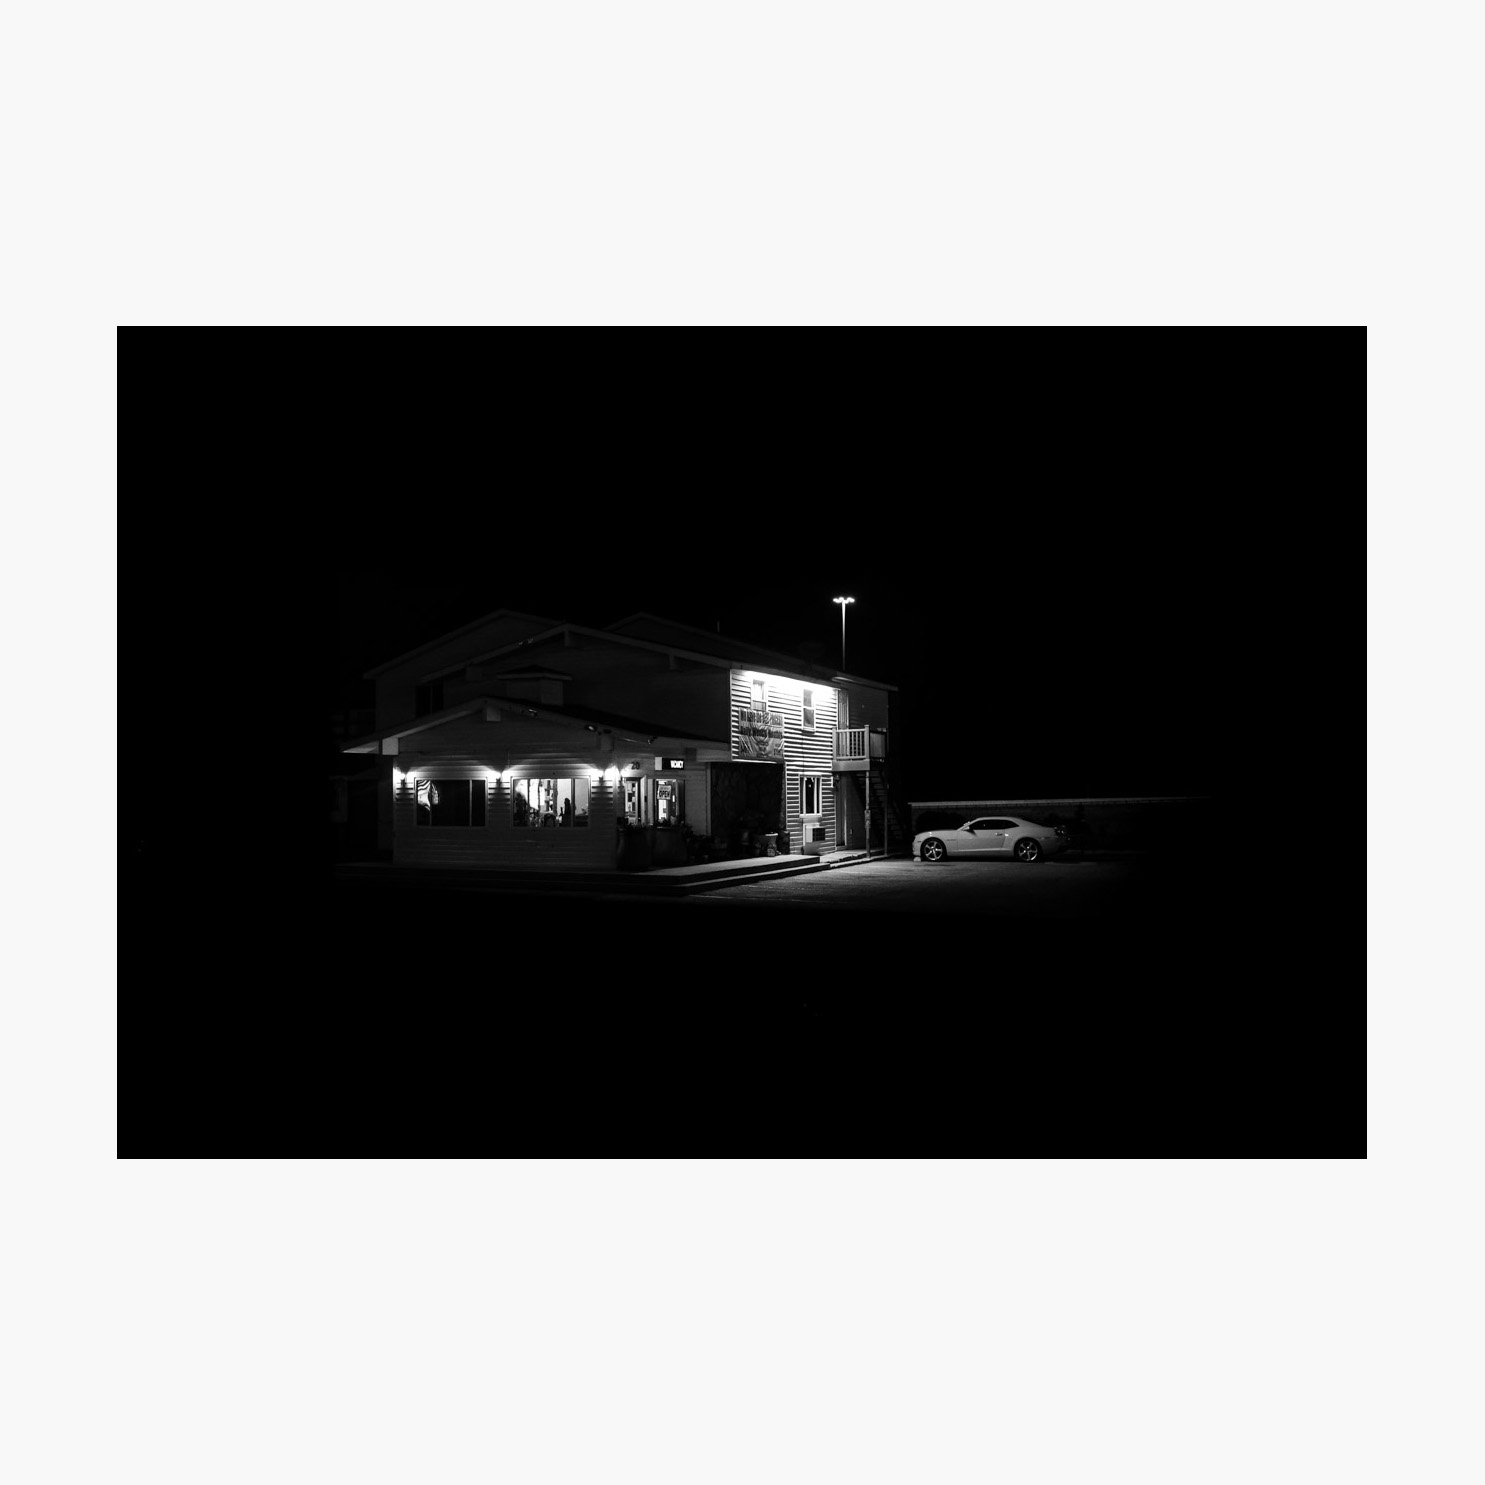 ©-Harry-W-Edmonds-2018-@photographersnote-the-long-road-PN03.jpg